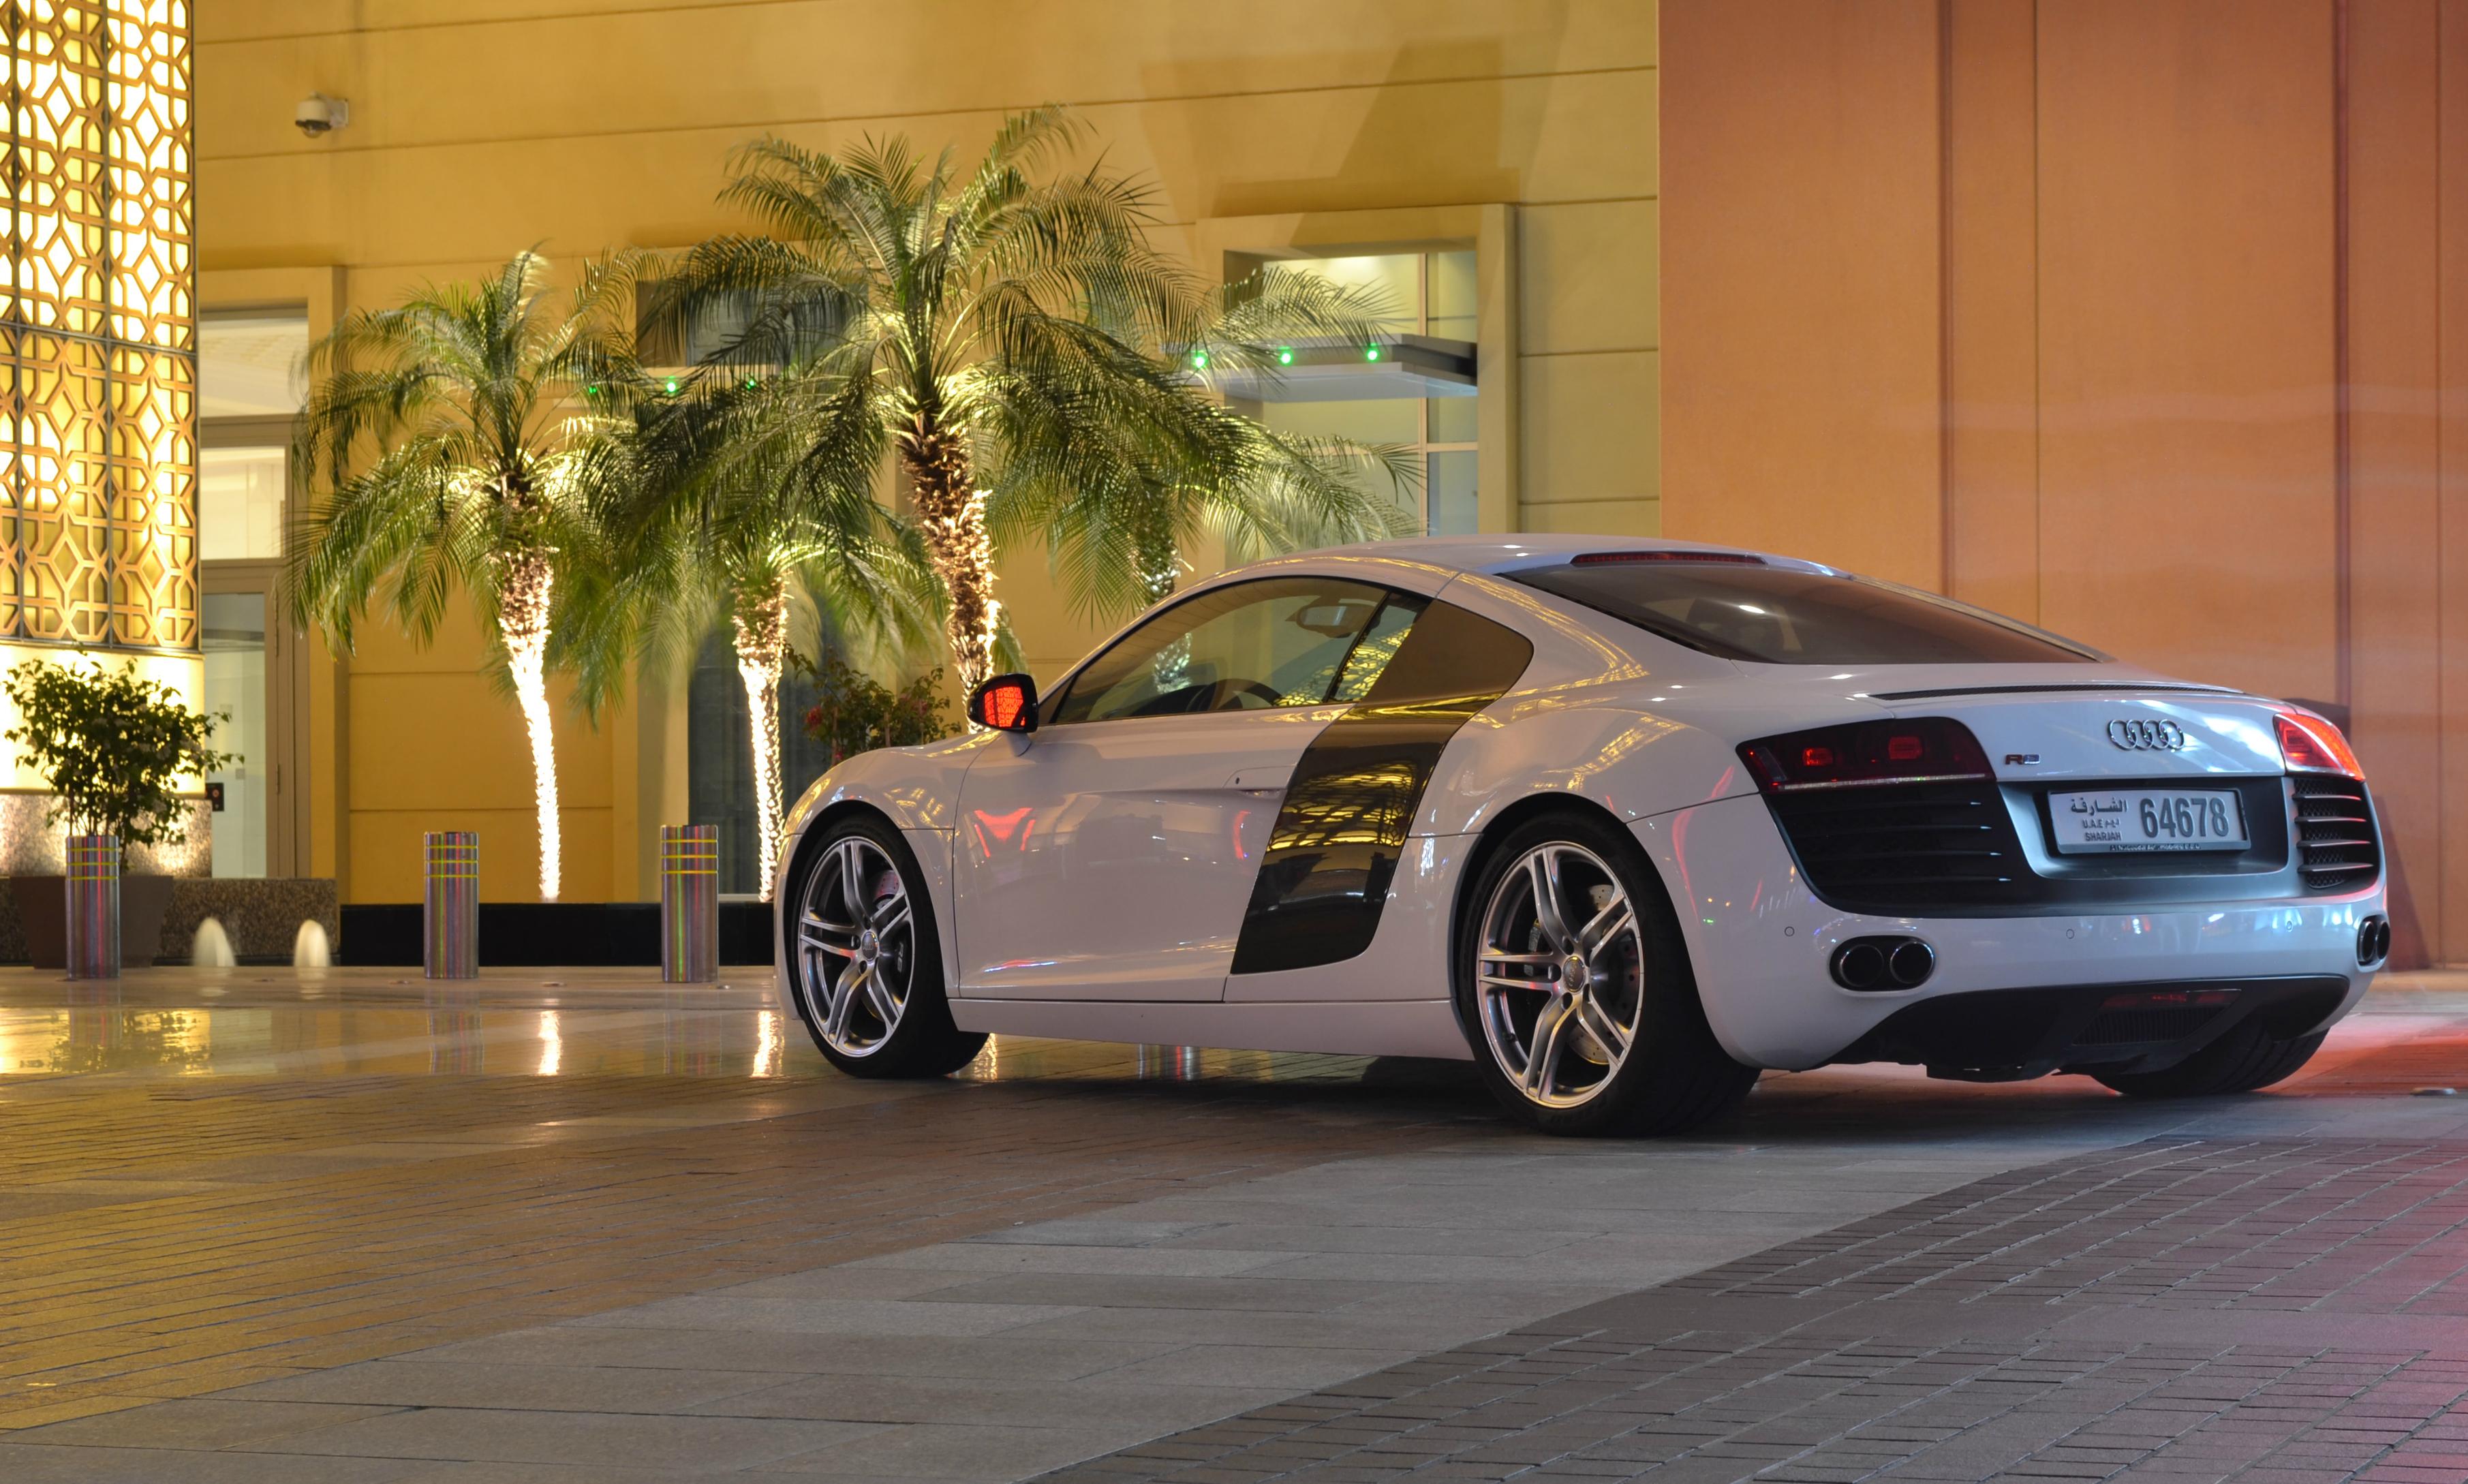 Wallpaper White Street Night Supercars Nikon Dubai